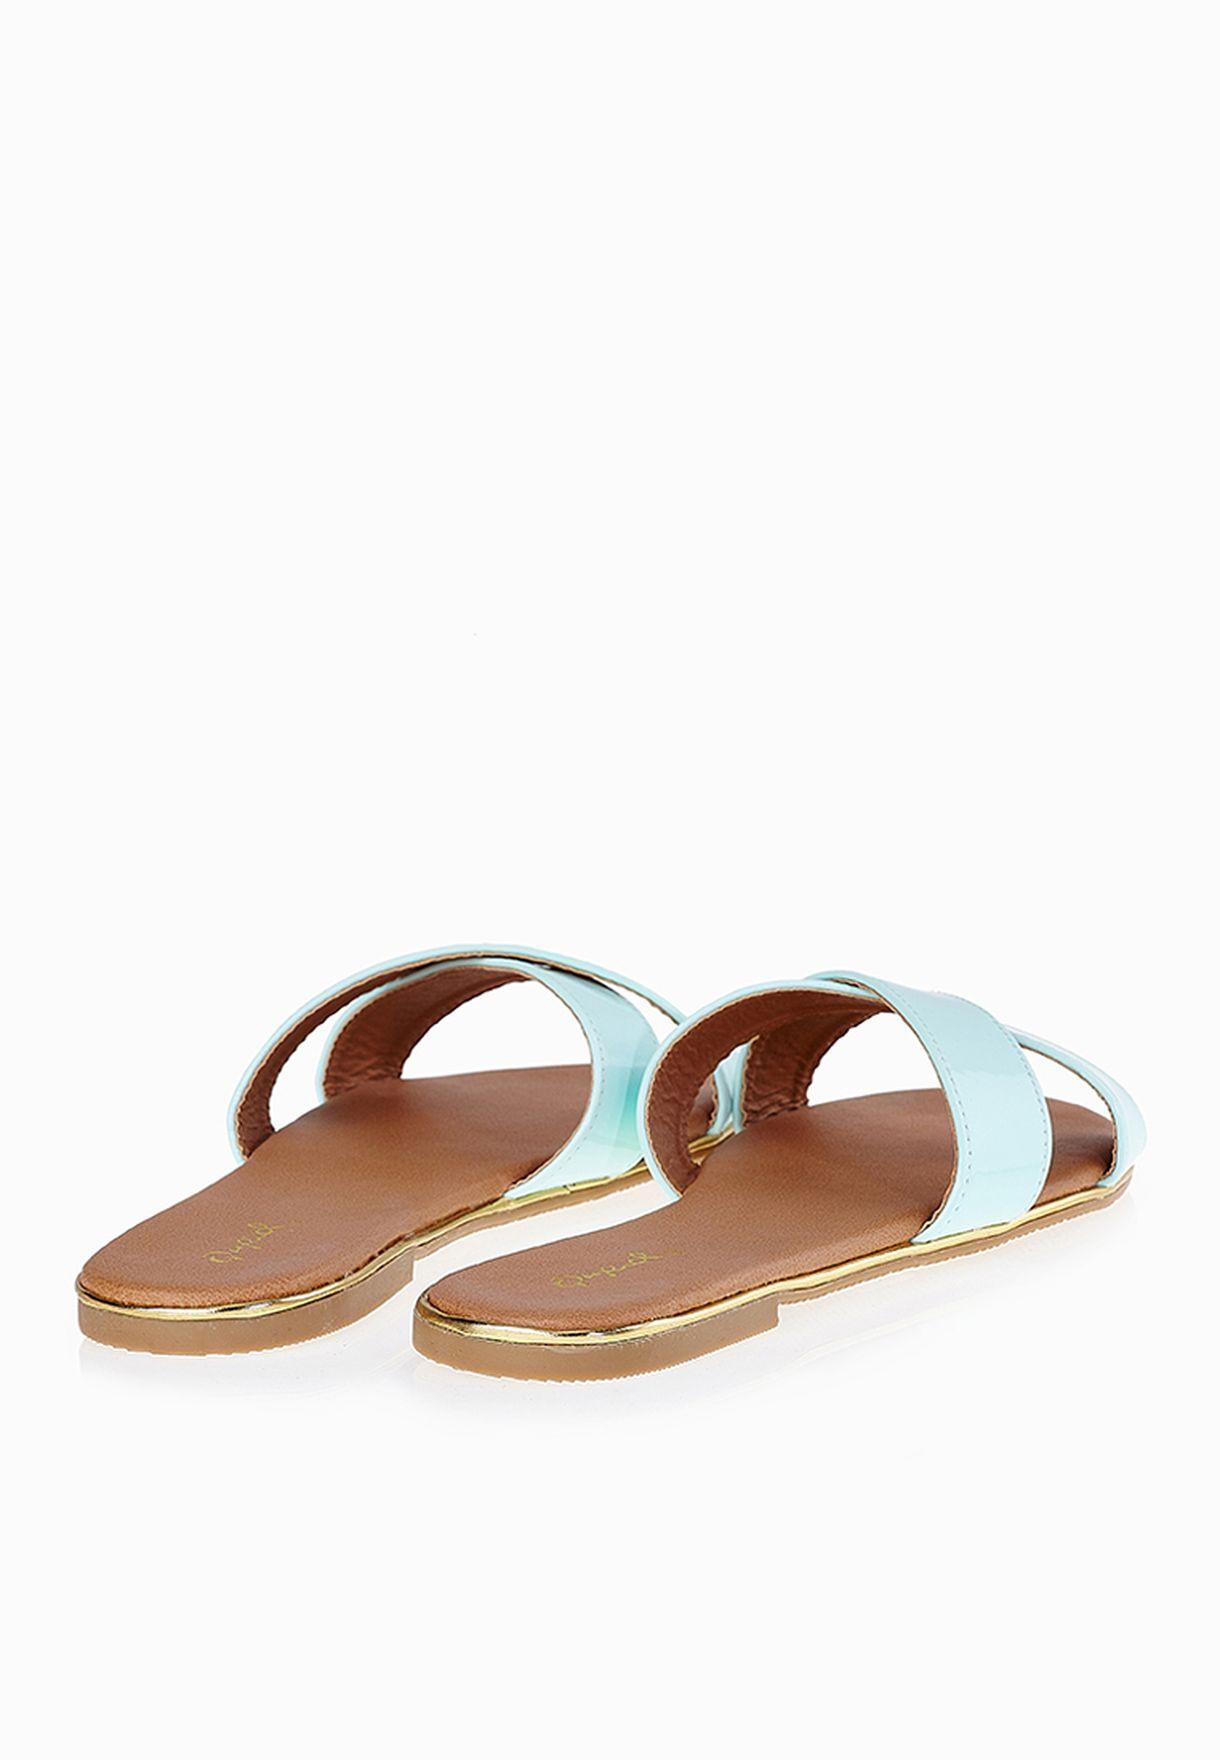 43b32ee2f0f4 Shop Qupid blue Cross Strap Slide Sandals for Women in Oman ...